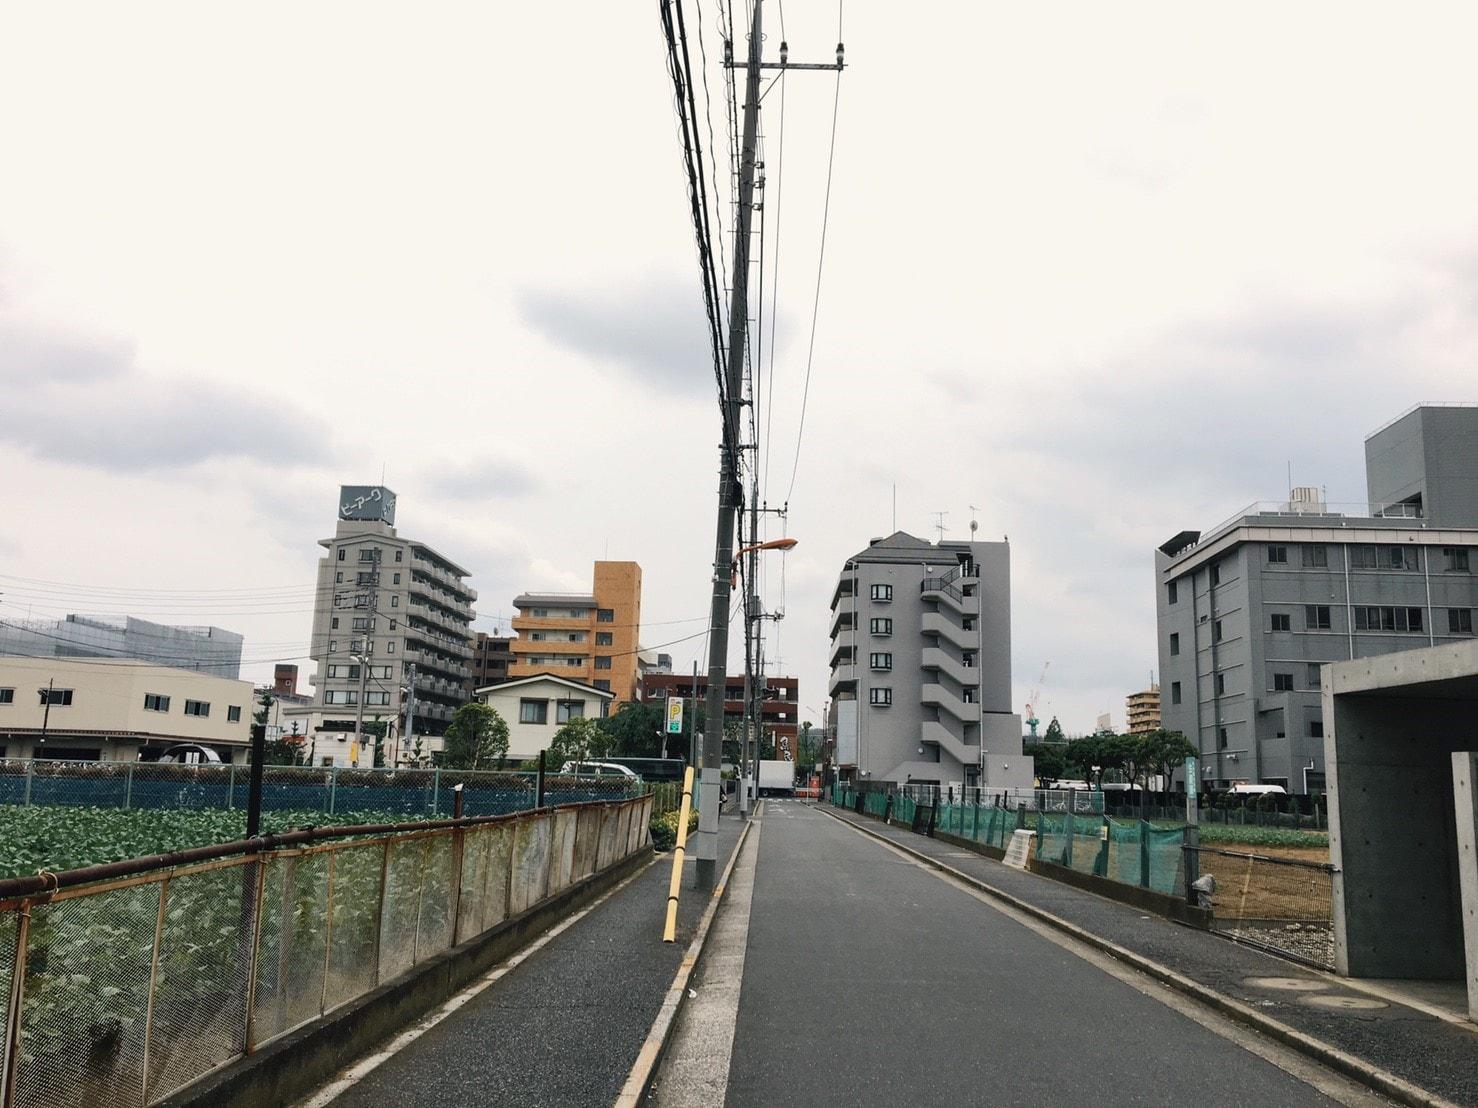 北綾瀬駅周辺の住宅街(畑)